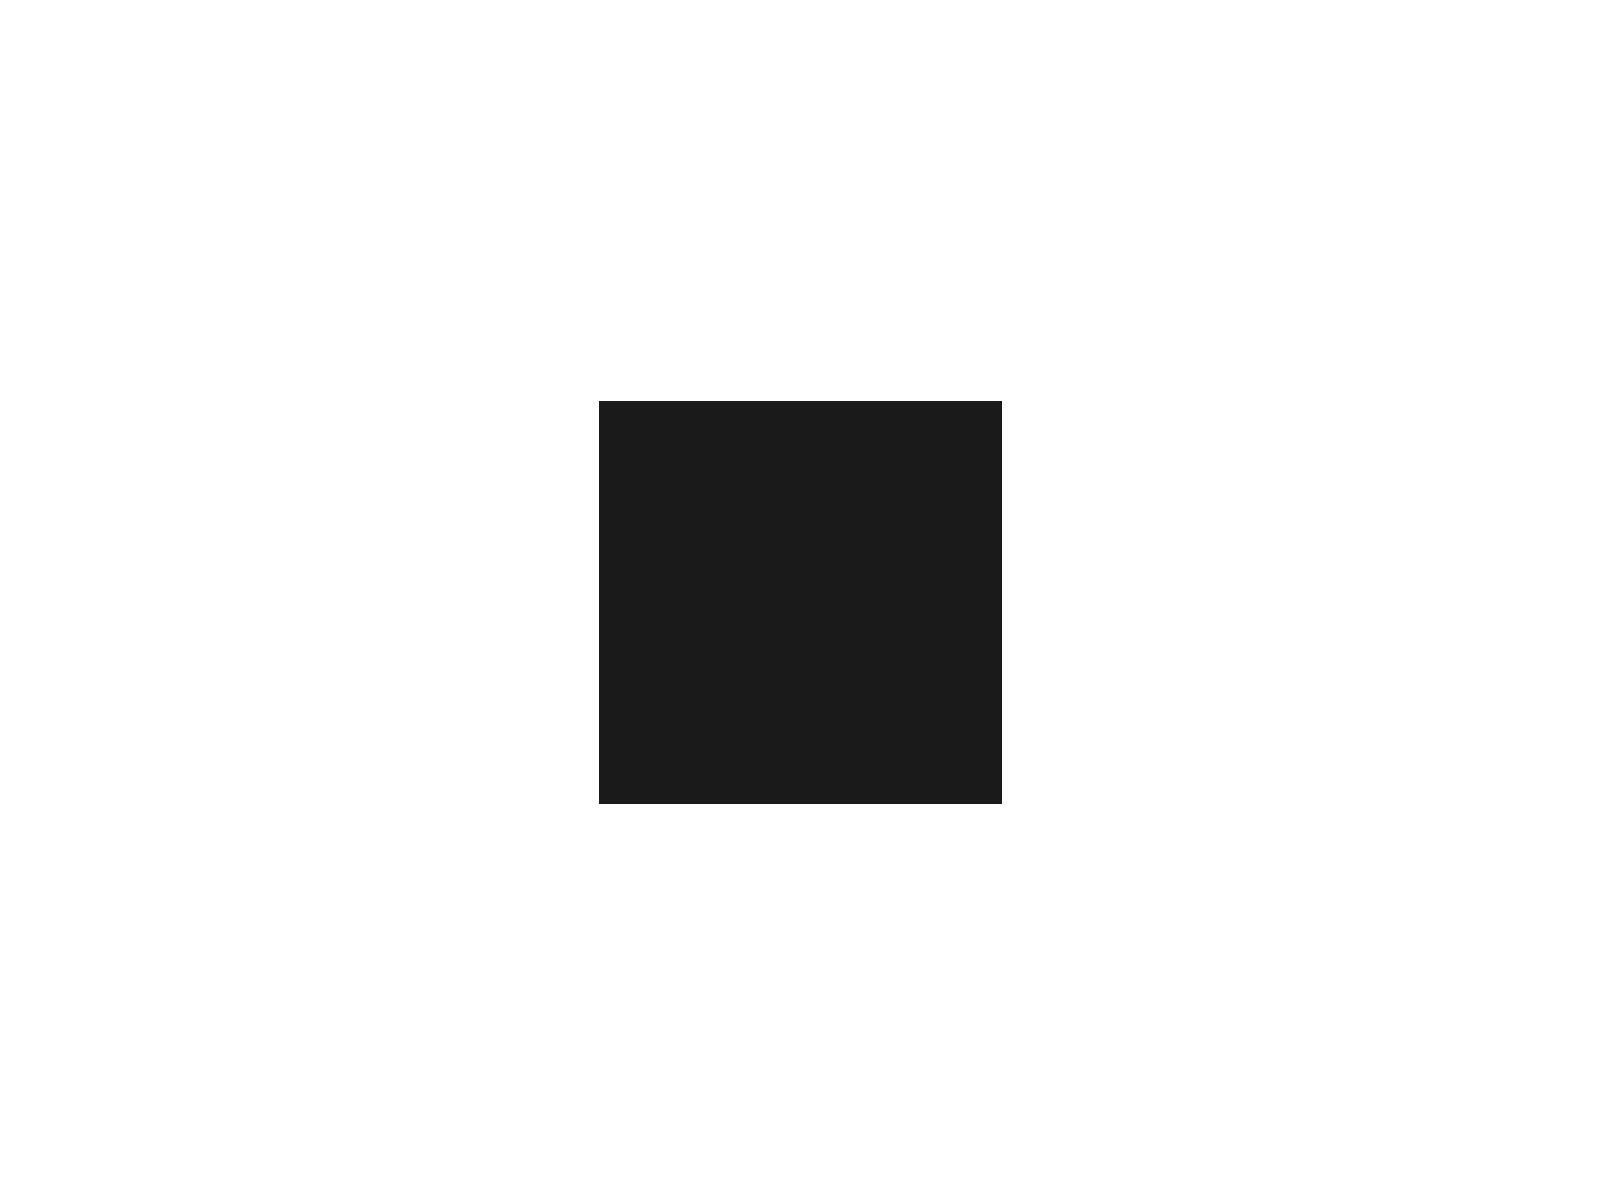 200325_logo_0017_WH